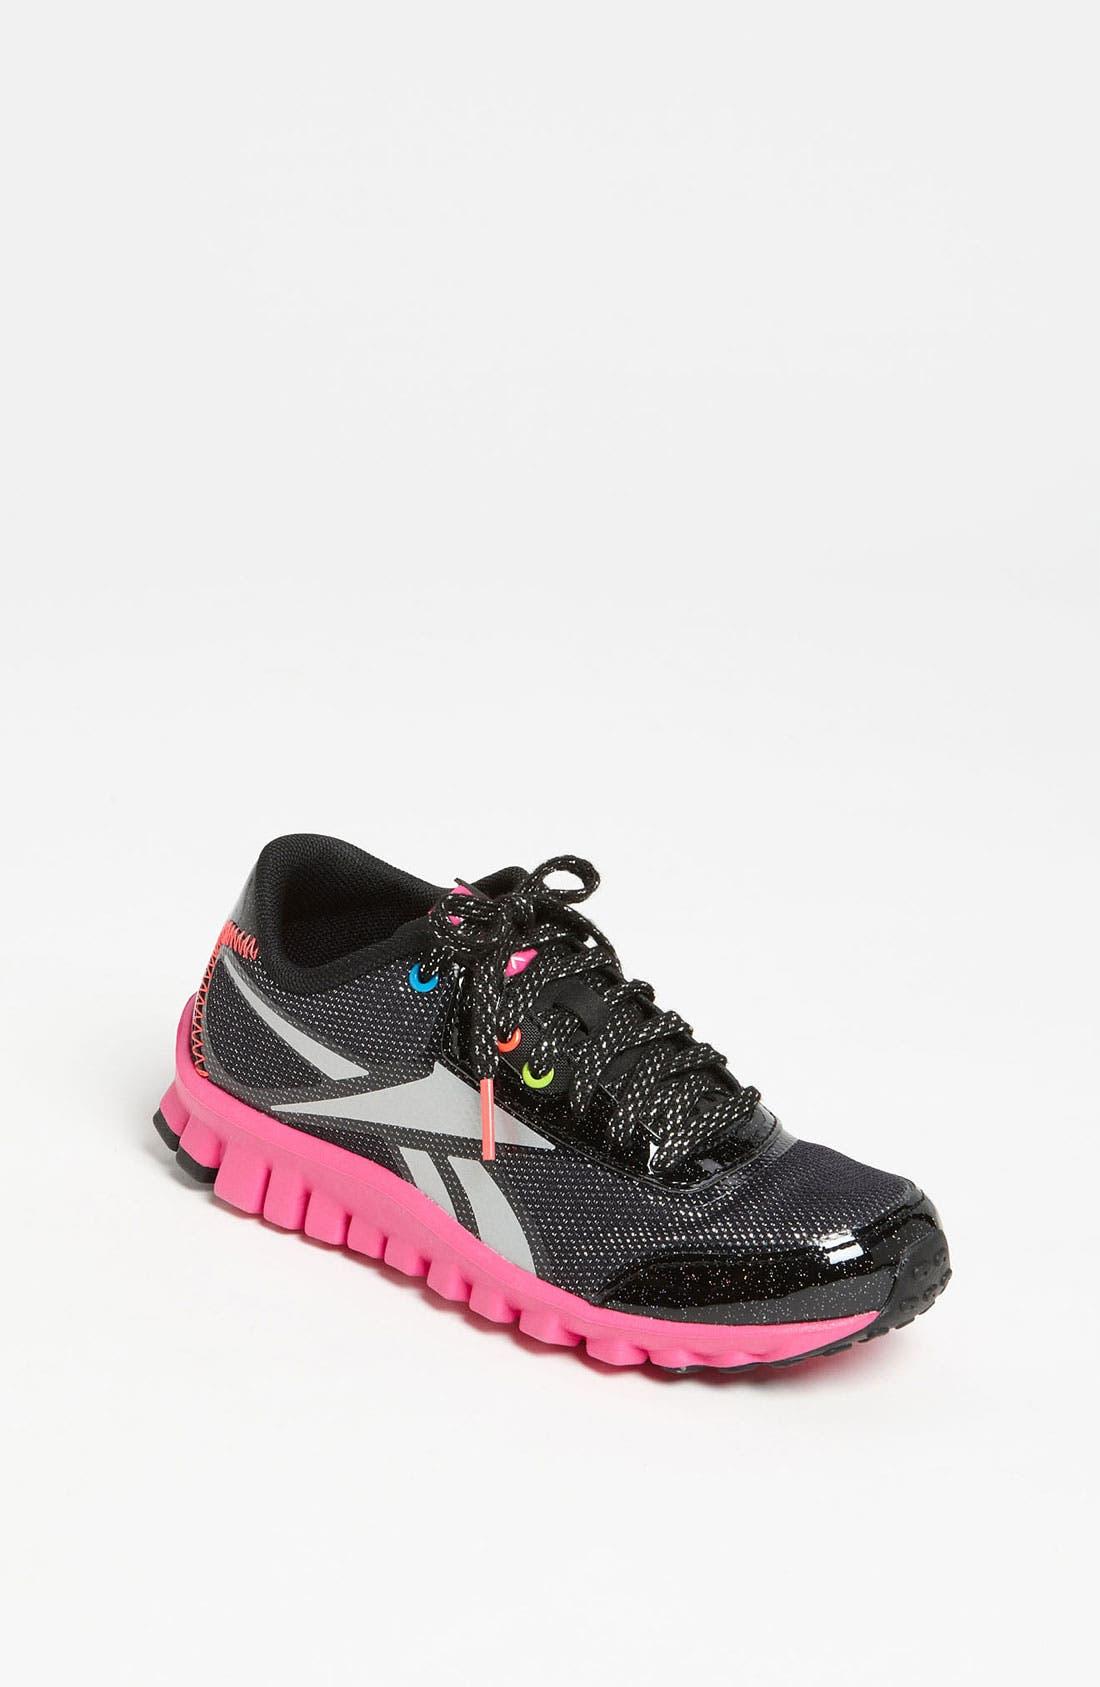 Main Image - Reebok 'RealFlex Optimal 3.0' Athletic Shoe (Toddler, Little Kid & Big Kid)